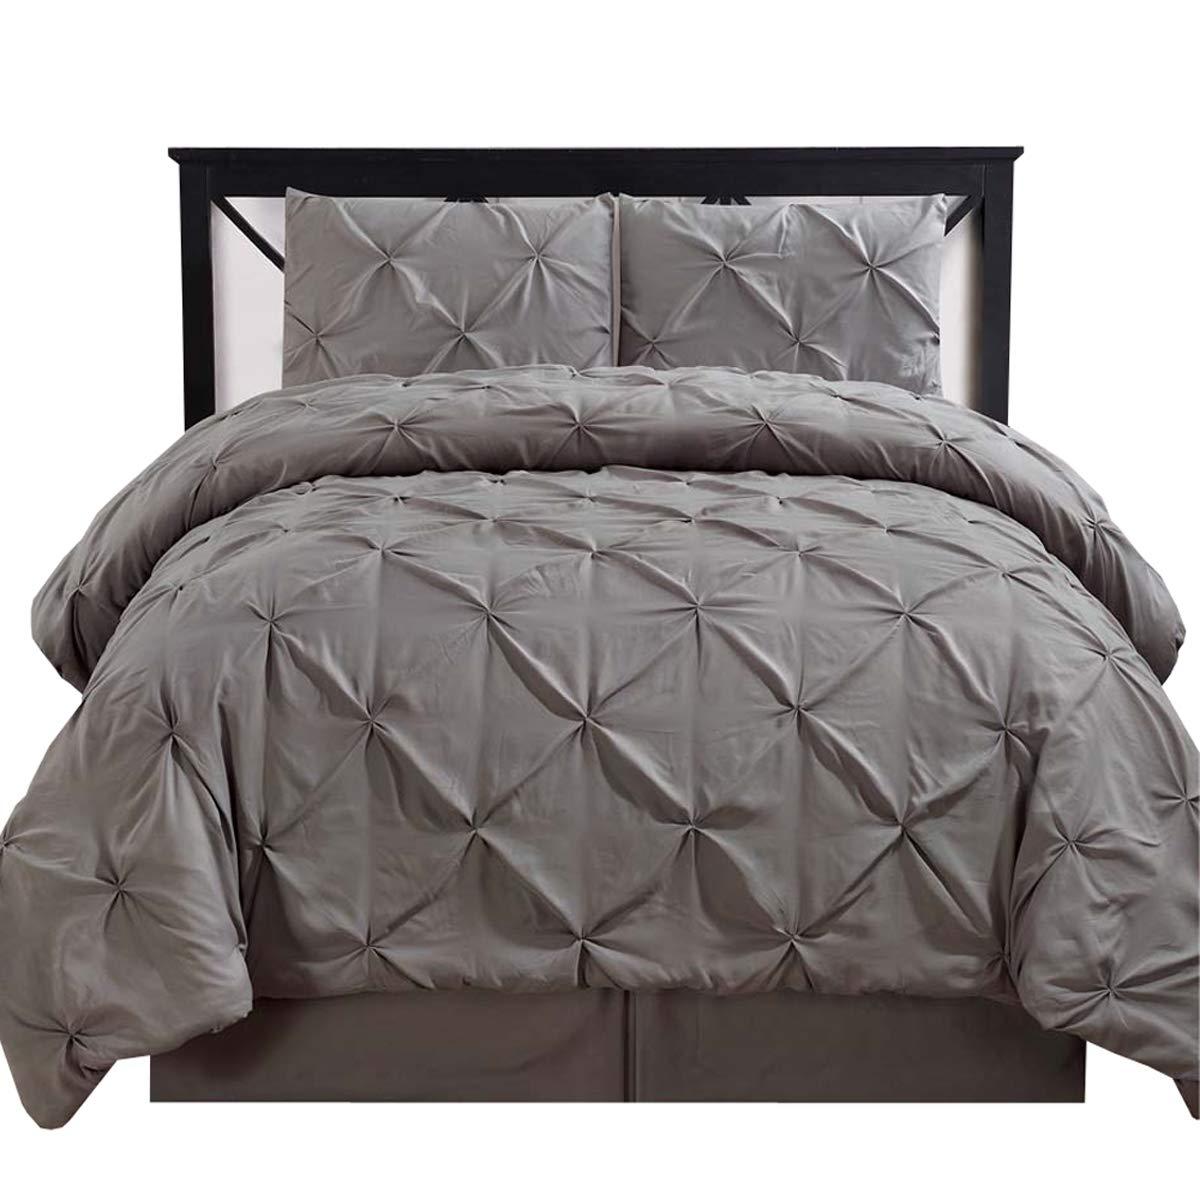 Royal Hotel Oxford Decorative Pinch Pleat Comforter Set, 4 Pieces, Hypoallergenic Comforter, Down Alternative Fill, King, Gray